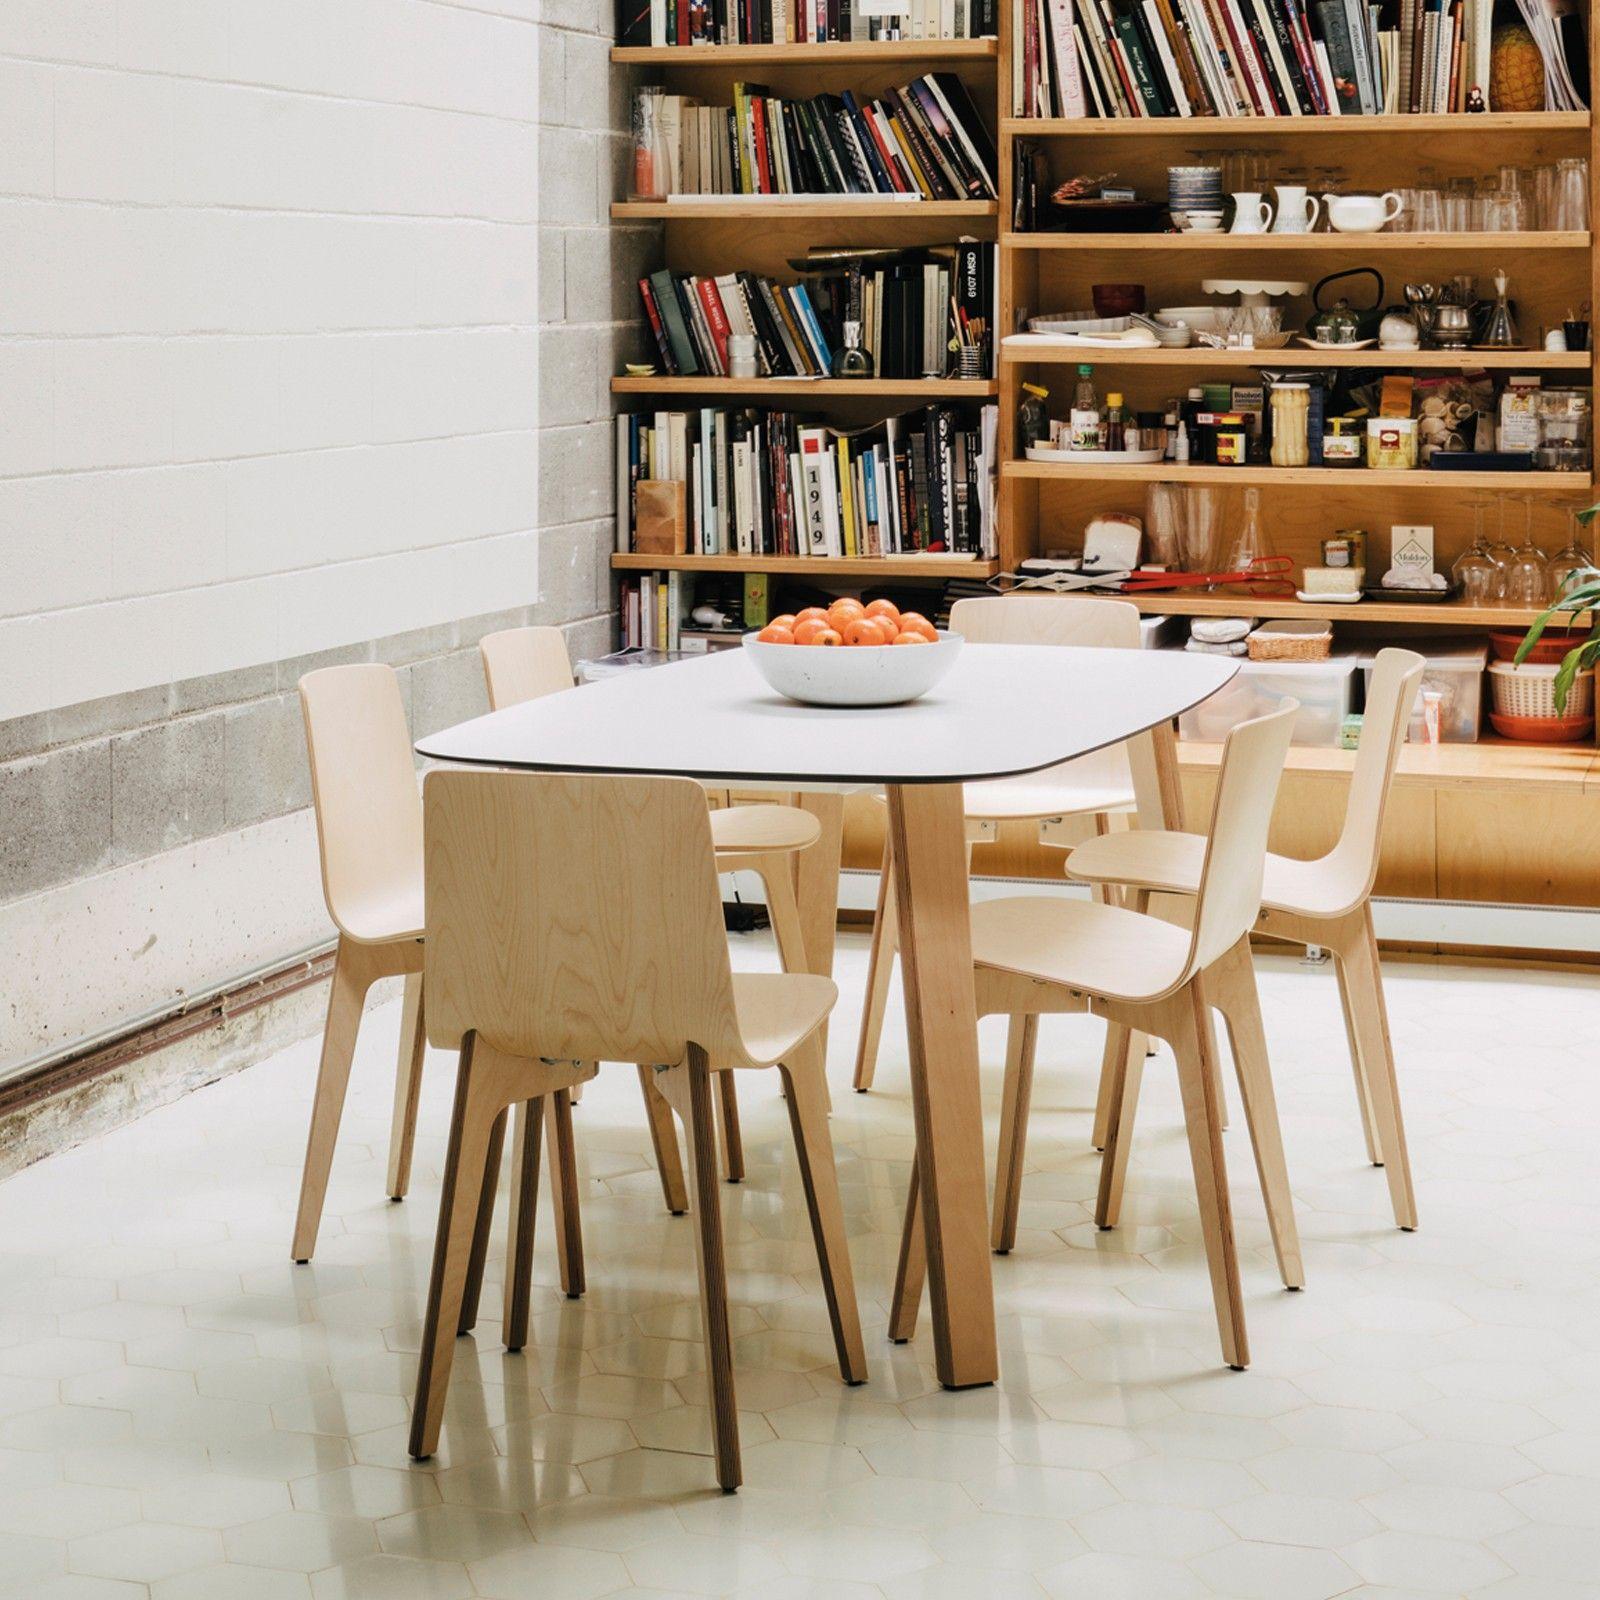 LOTTUS WOOD - KE-ZU Furniture   residential and contract furniture ...